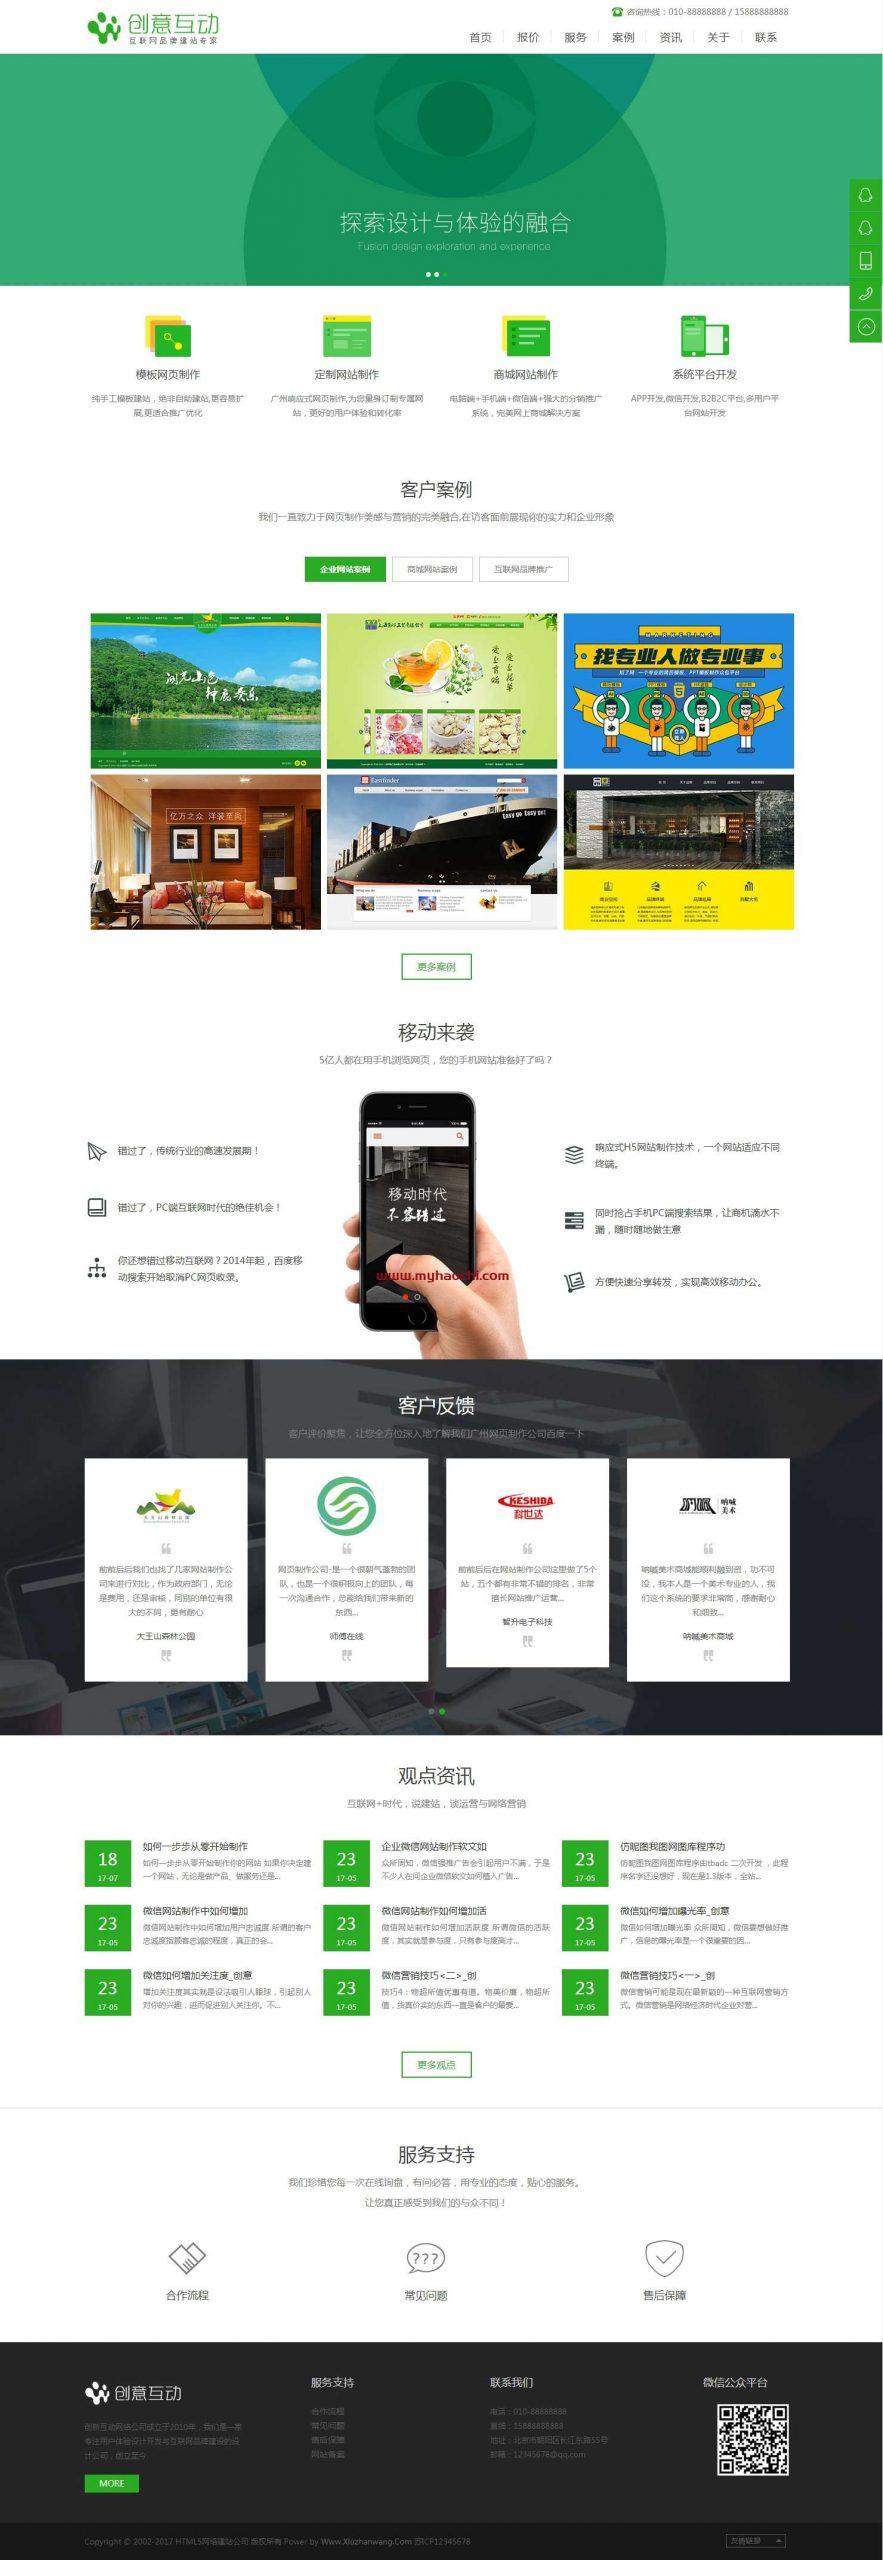 【dedecms】自适应公司建站网络科技公司企业织梦网站模板-爱资源分享